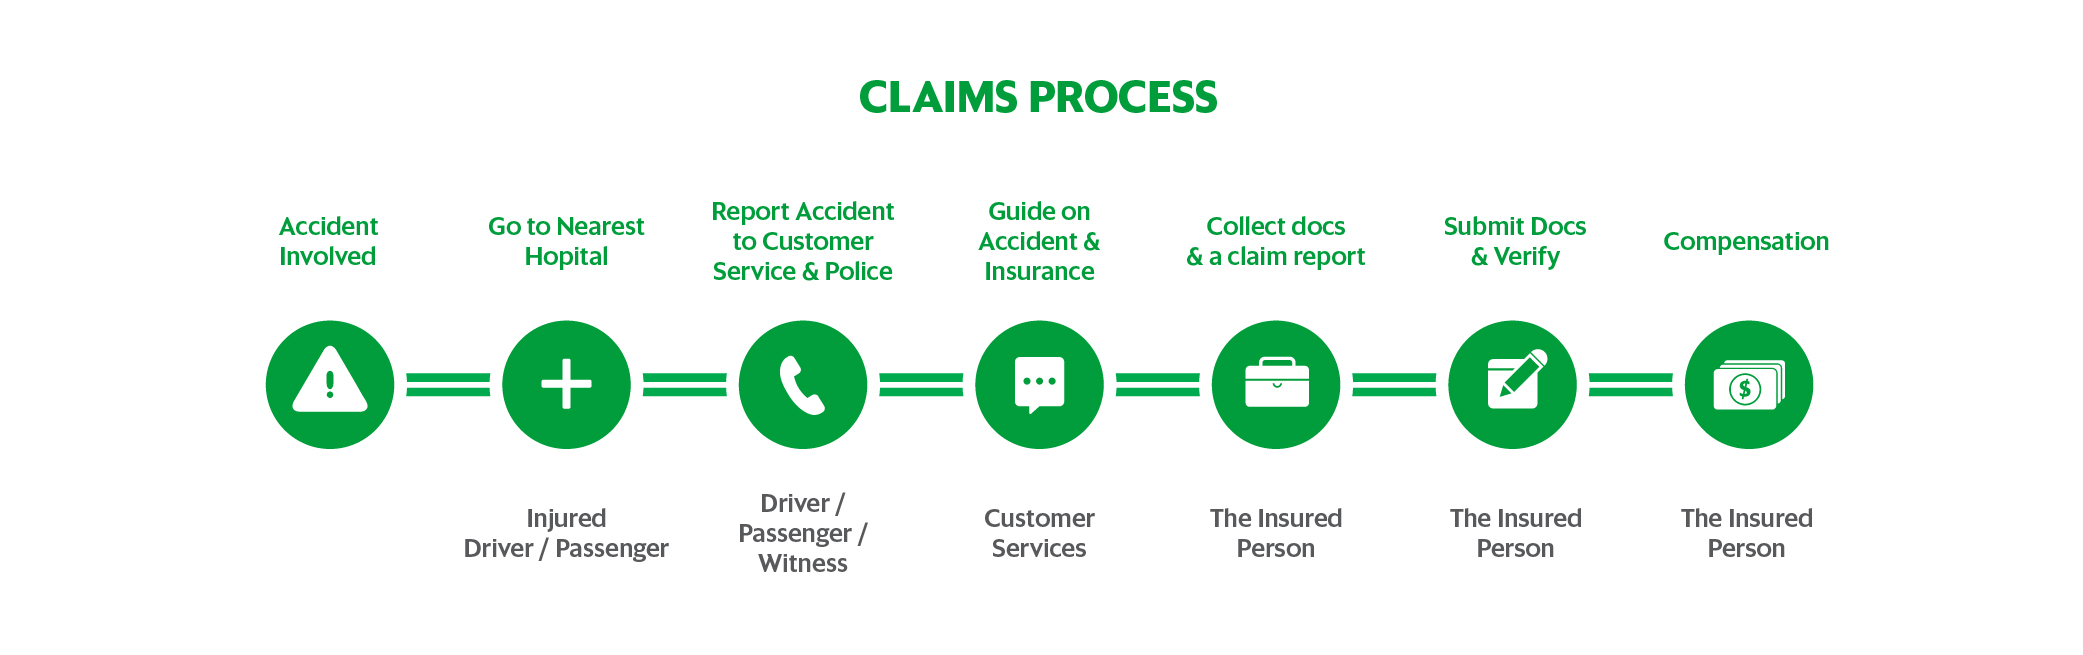 Travel Insurance Claim Procedure